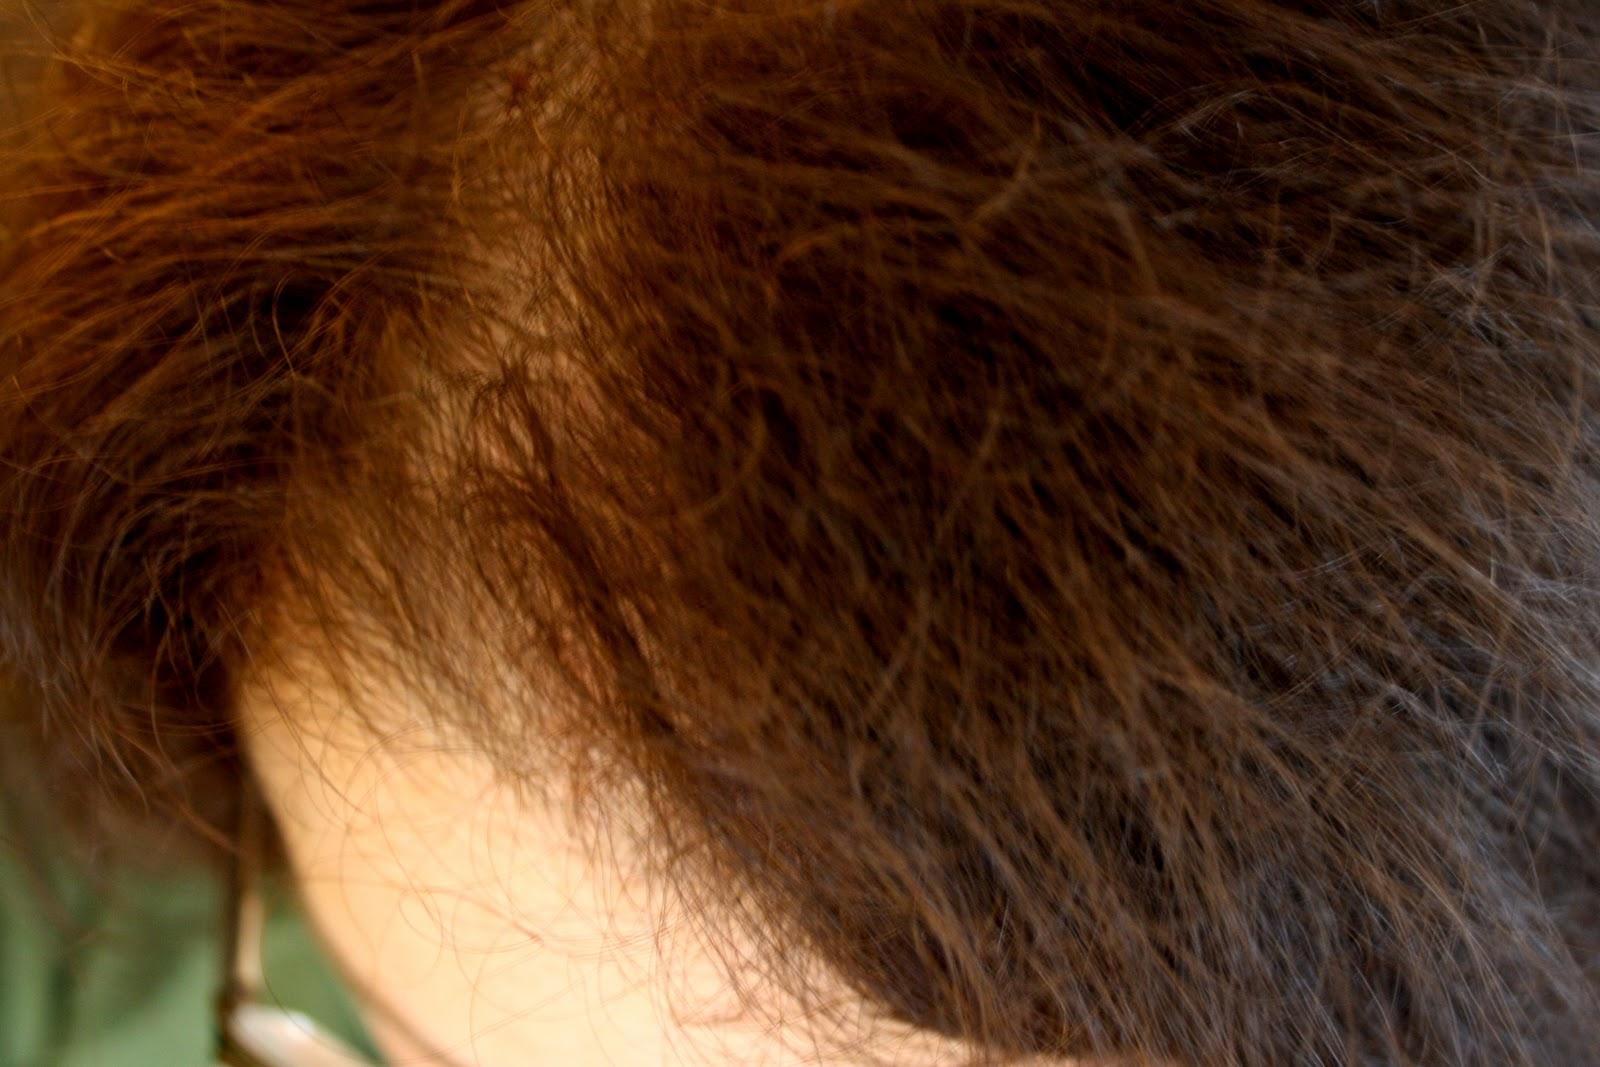 Reasonably Well: Hair Today, Gone Tomorrow